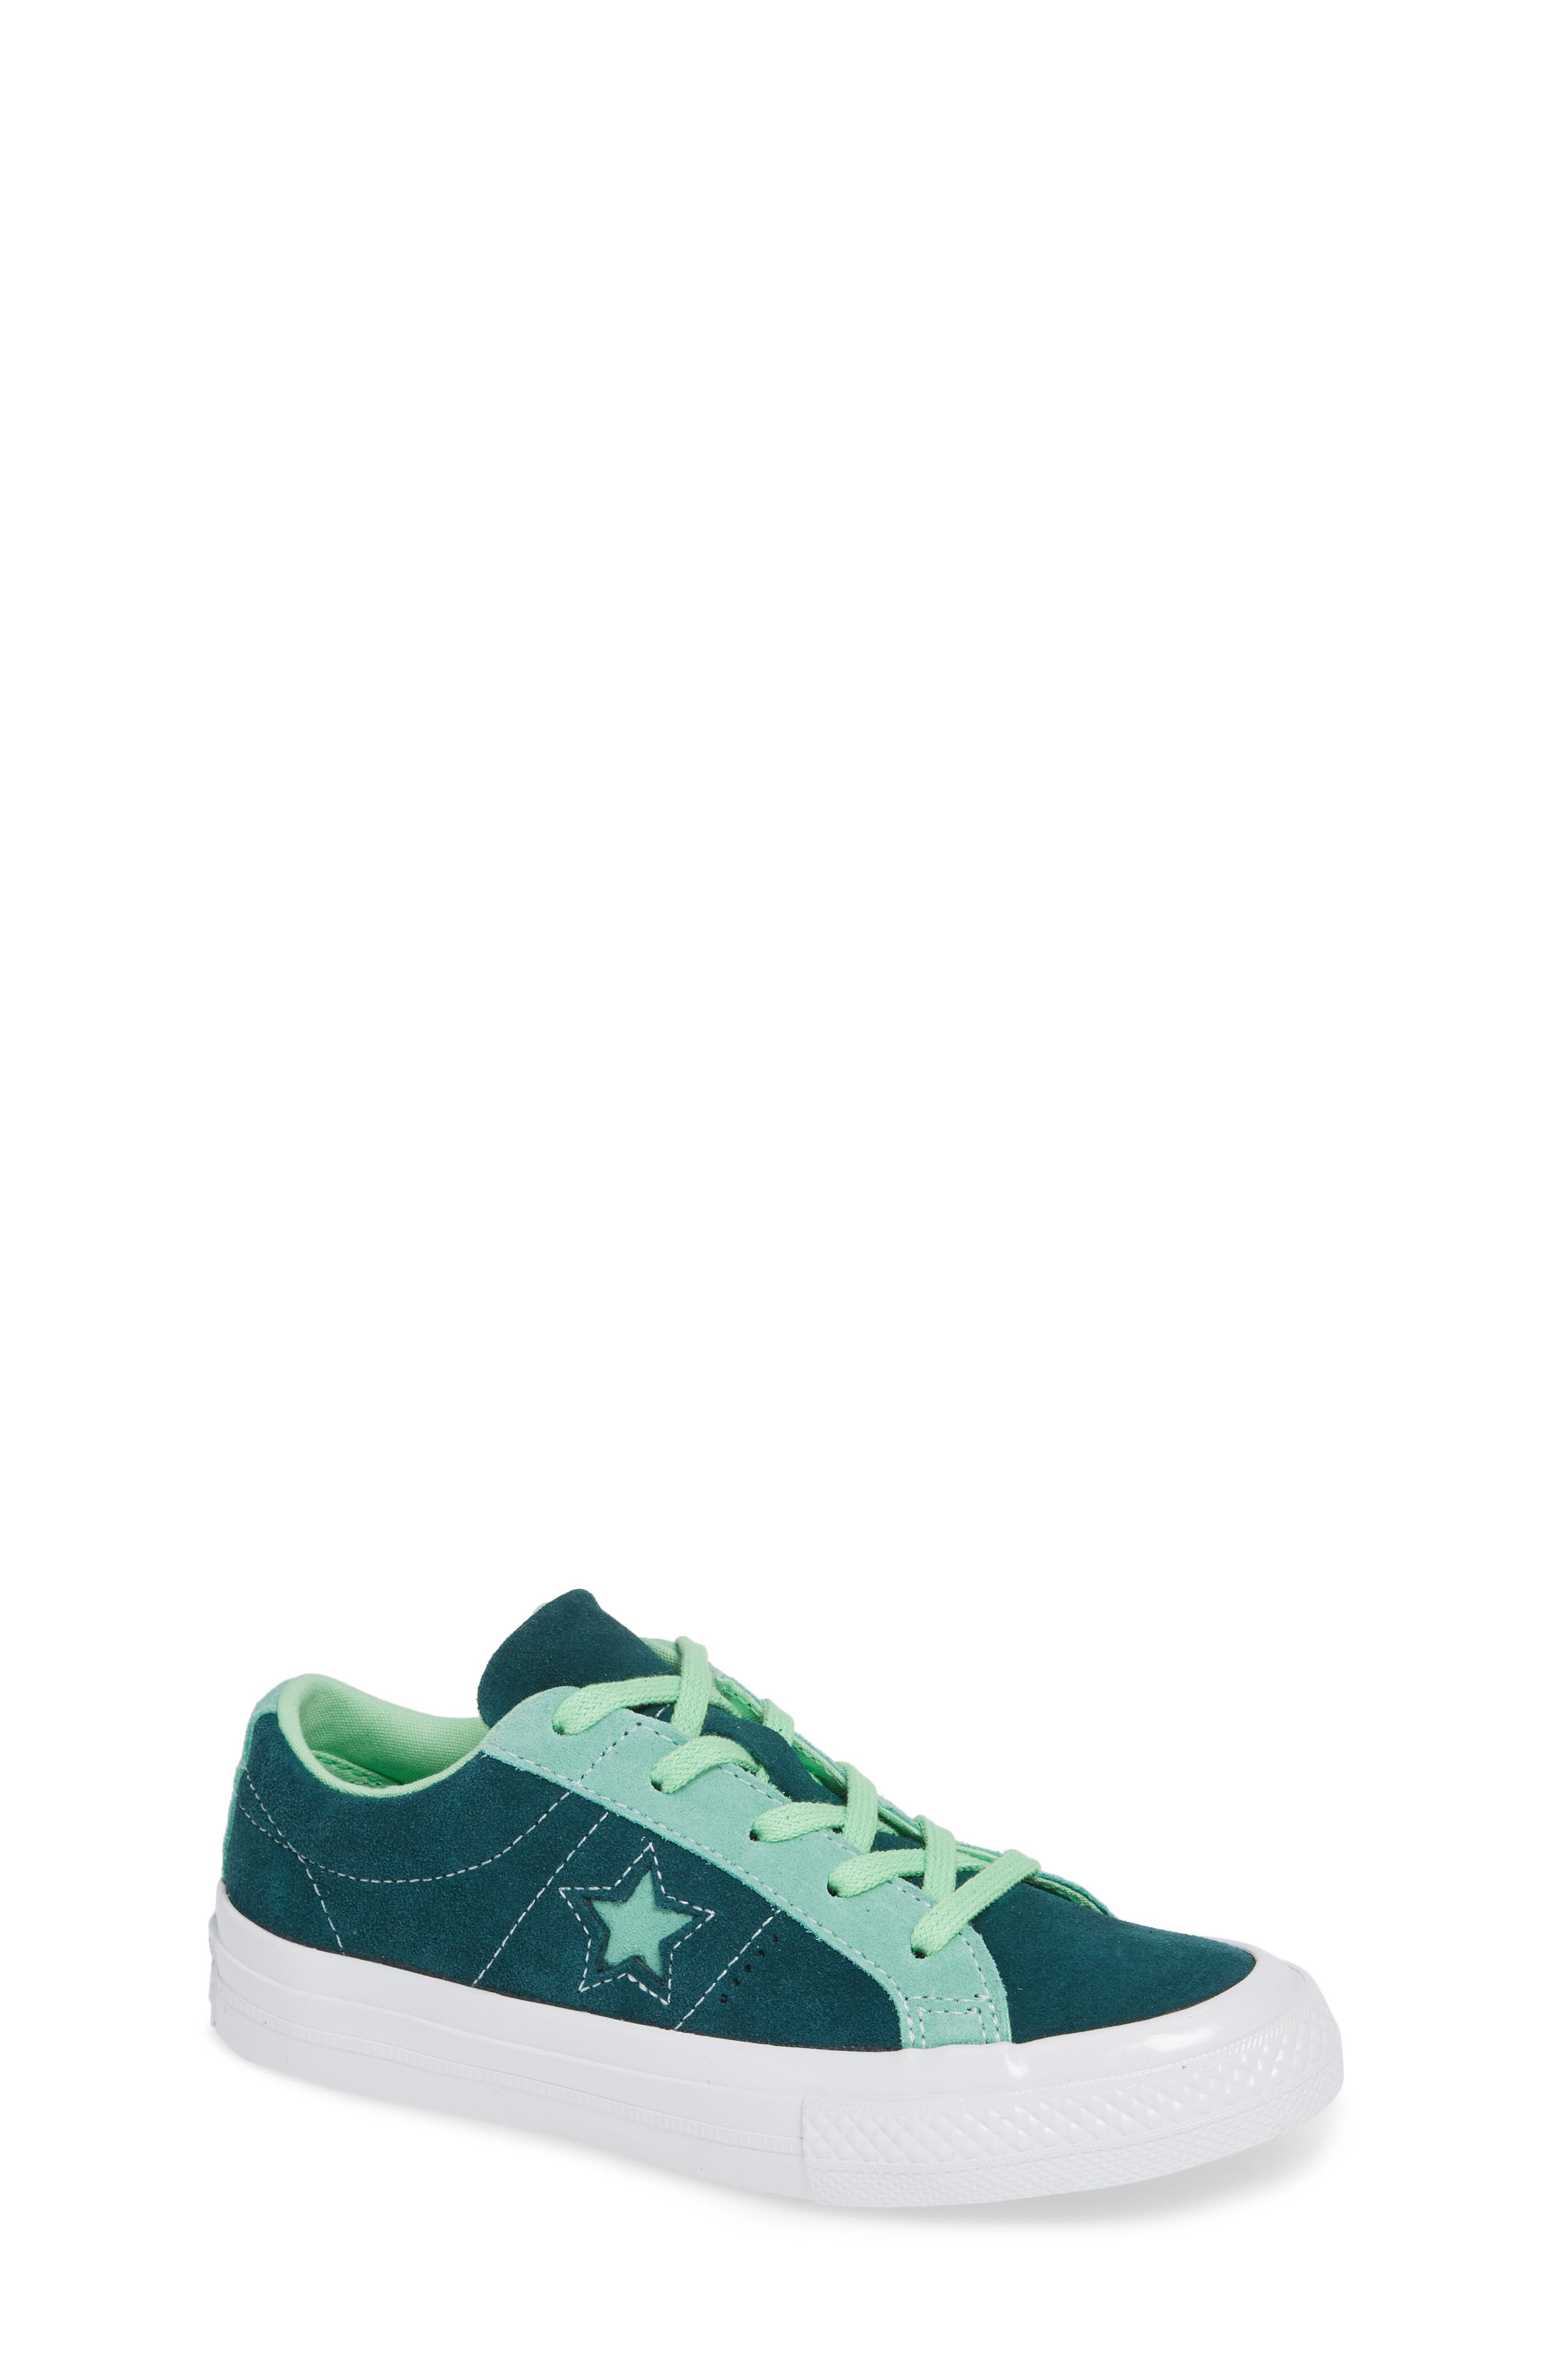 boy's converse one star carnival low top sneaker, size 3 m - green